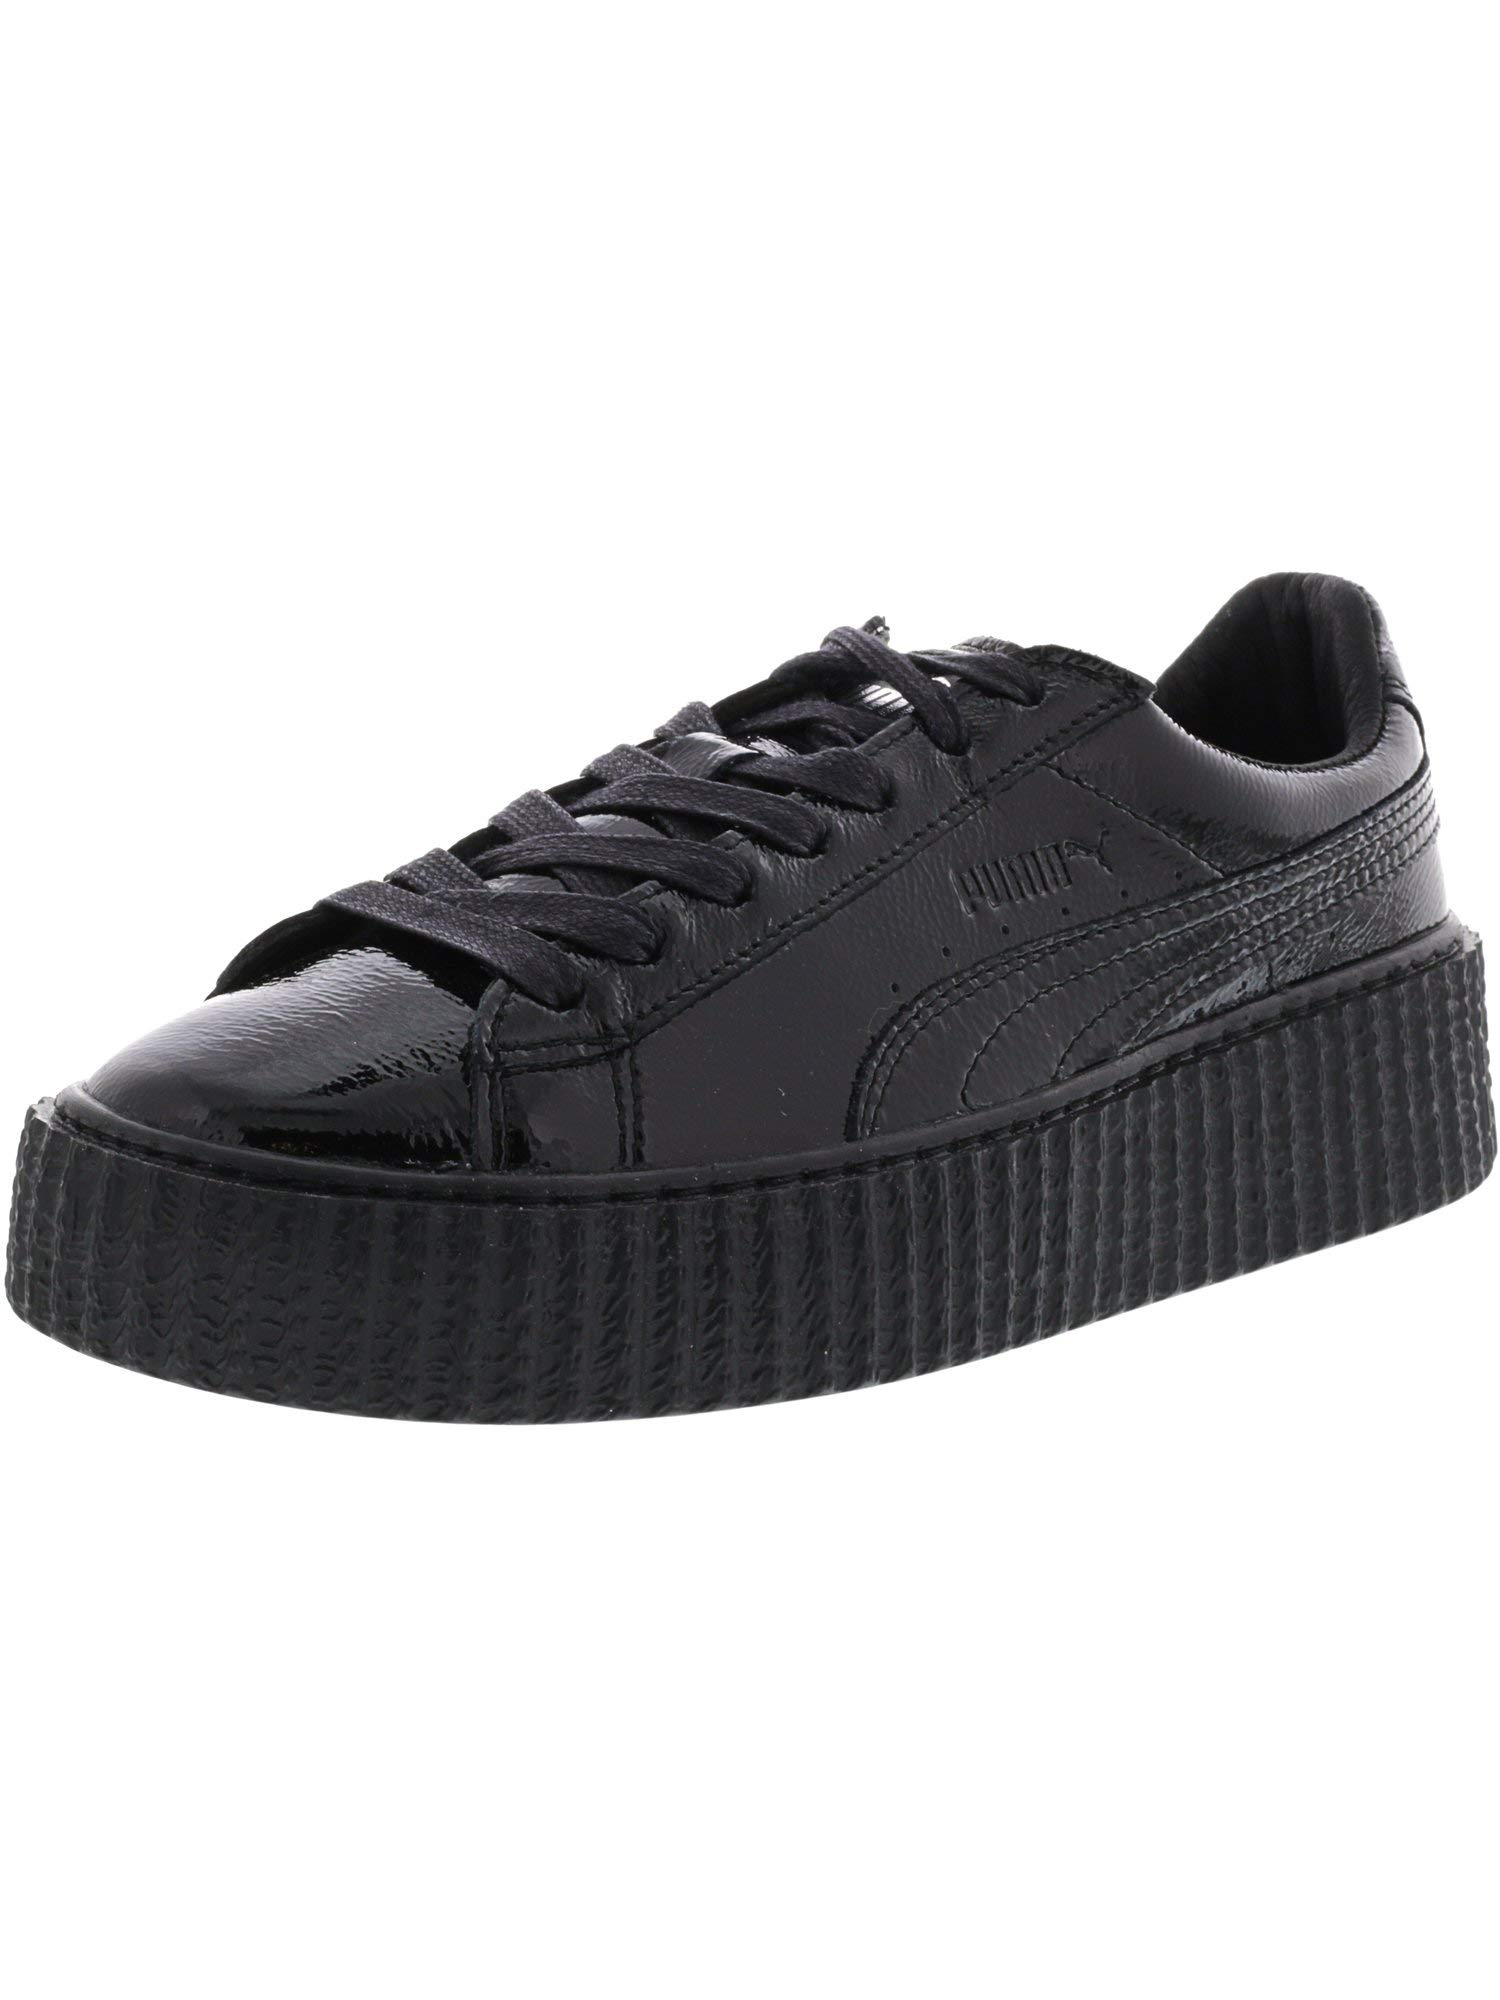 competitive price 90b19 02d50 PUMA Women's Fenty x PUMA Cracked Creeper Sneakers, Puma Black/Puma Black,  8.5 B(M) US